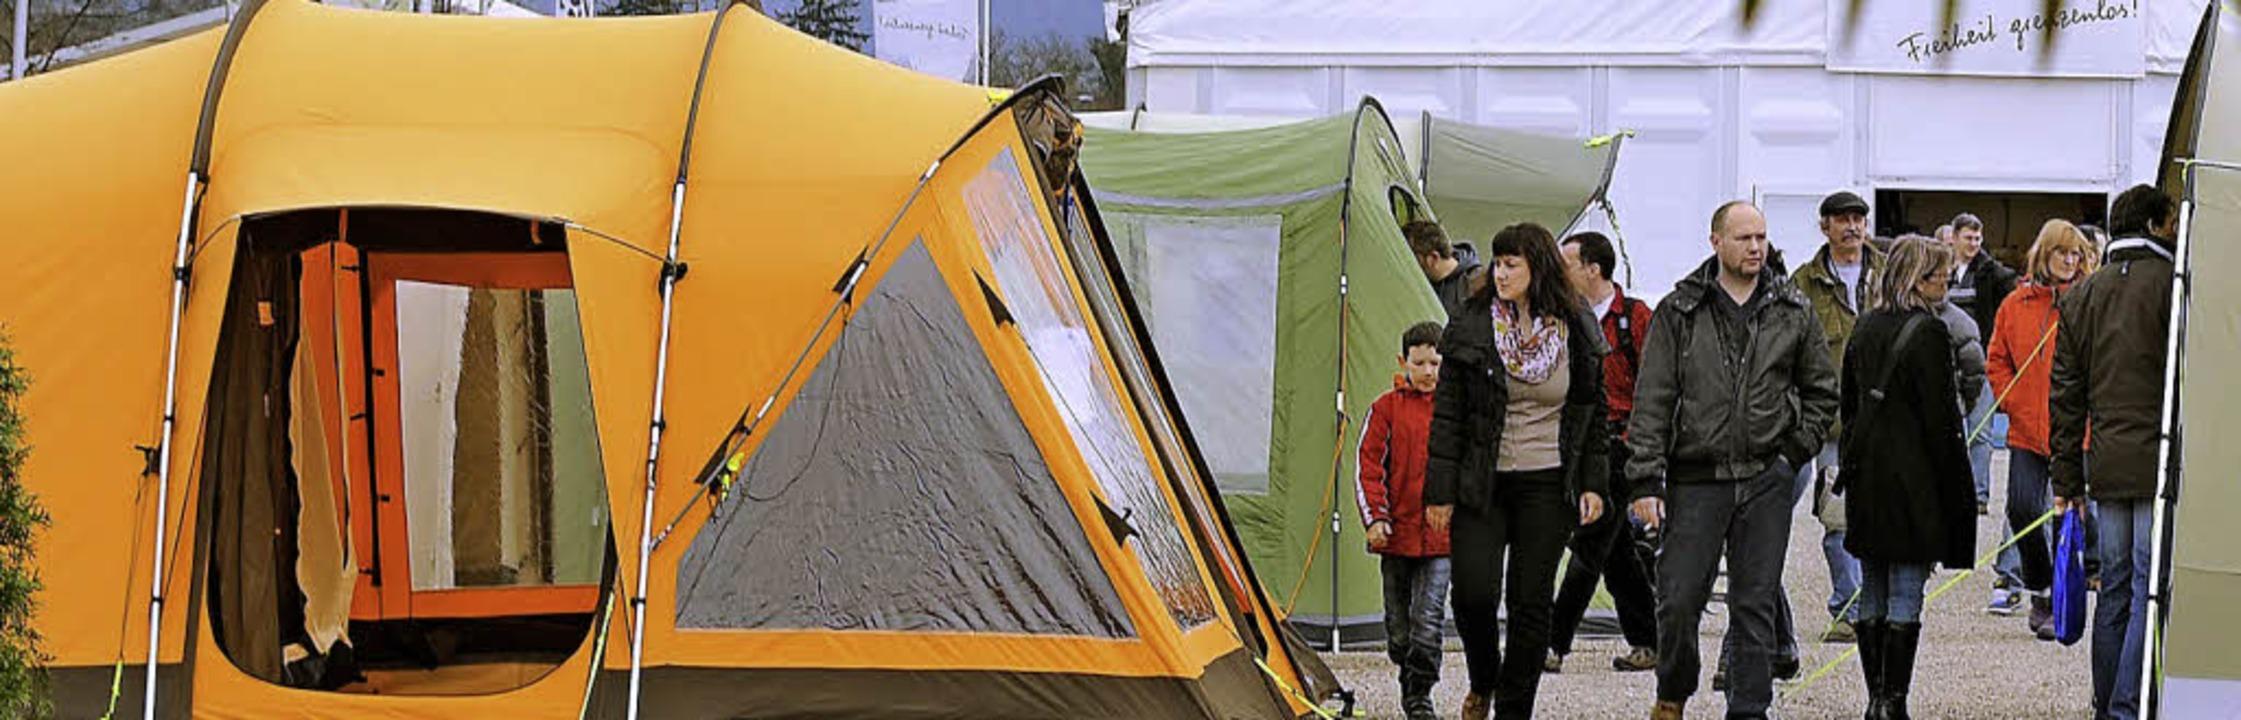 Neues Zelt? Neuer Caravan? Bei den CFT...en gibt's jede Menge Anregungen.  | Foto: Rita Eggstein